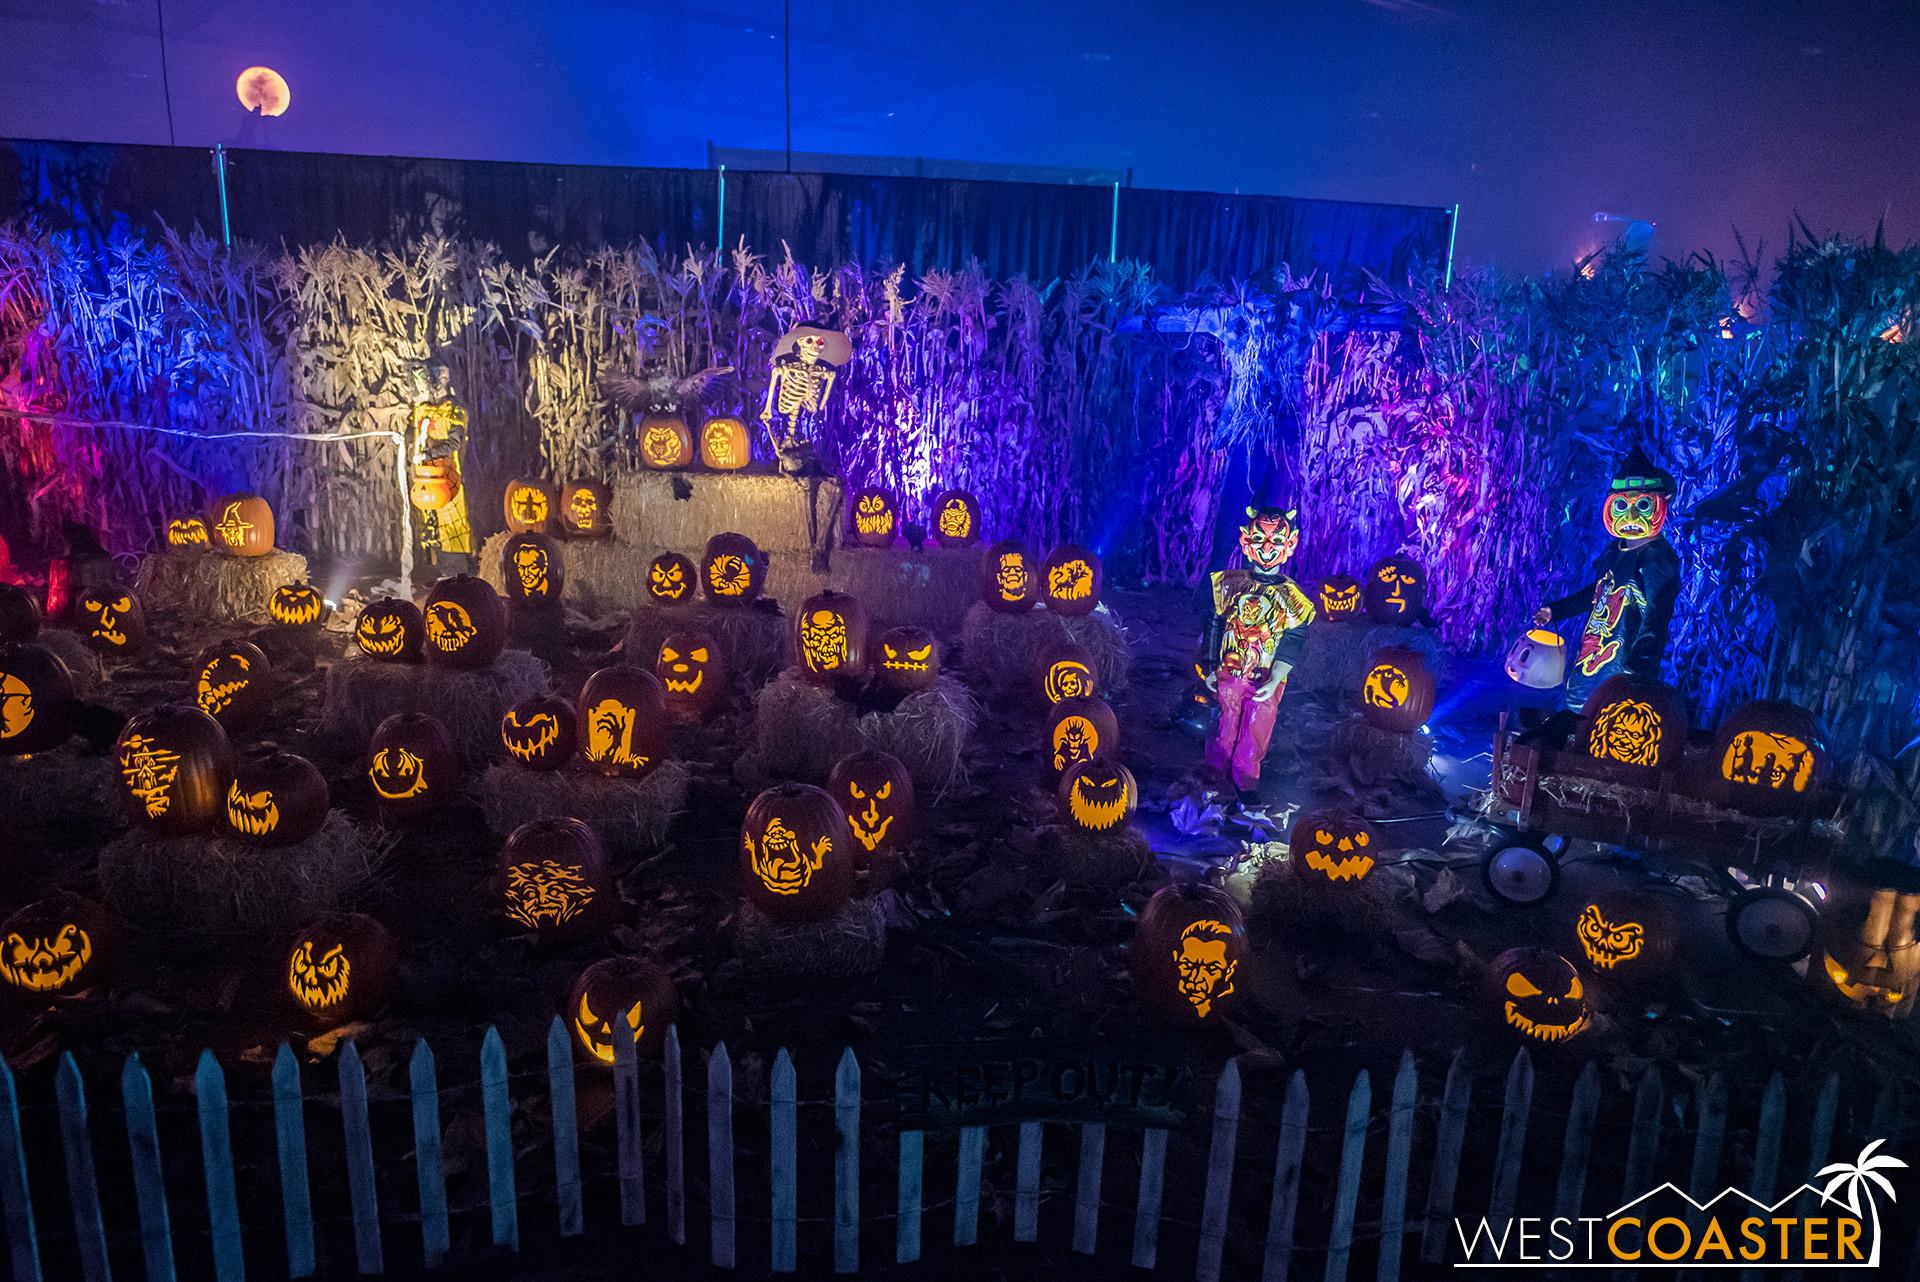 MSS-19_0809-06-WickedPumpkinHollow-0003.jpg